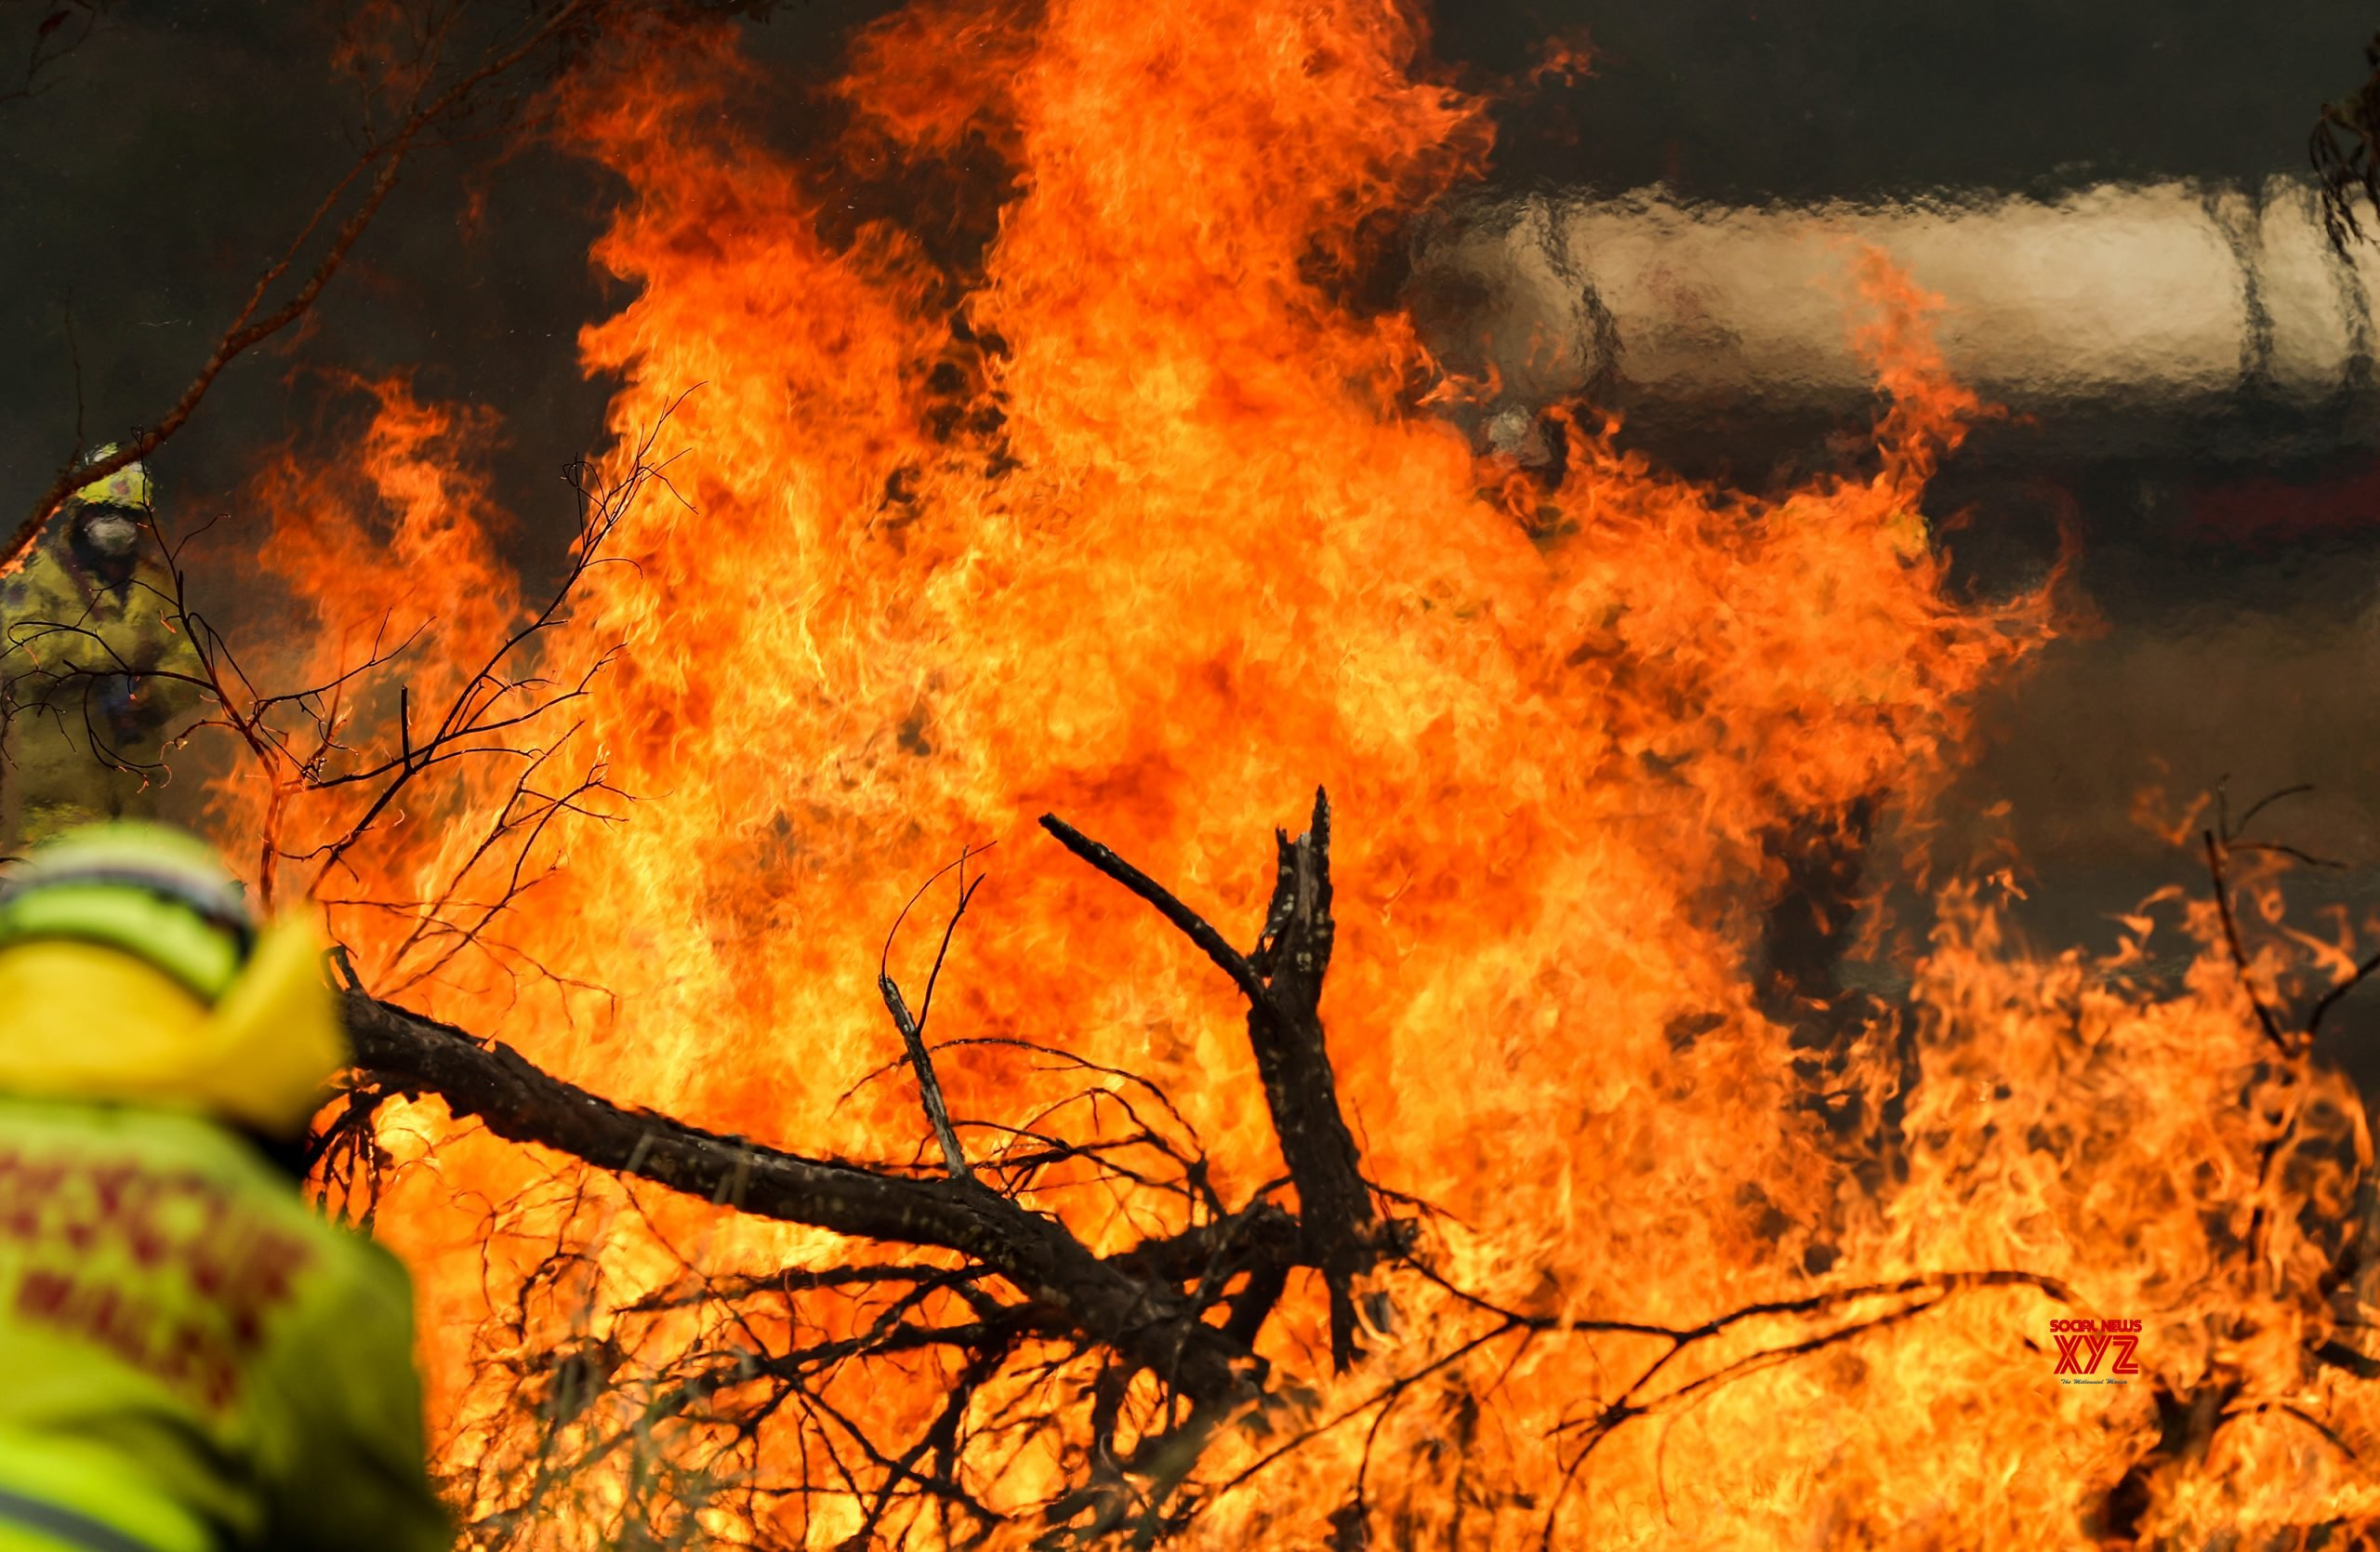 Bushfire danger elevated as heatwave continues in Australia